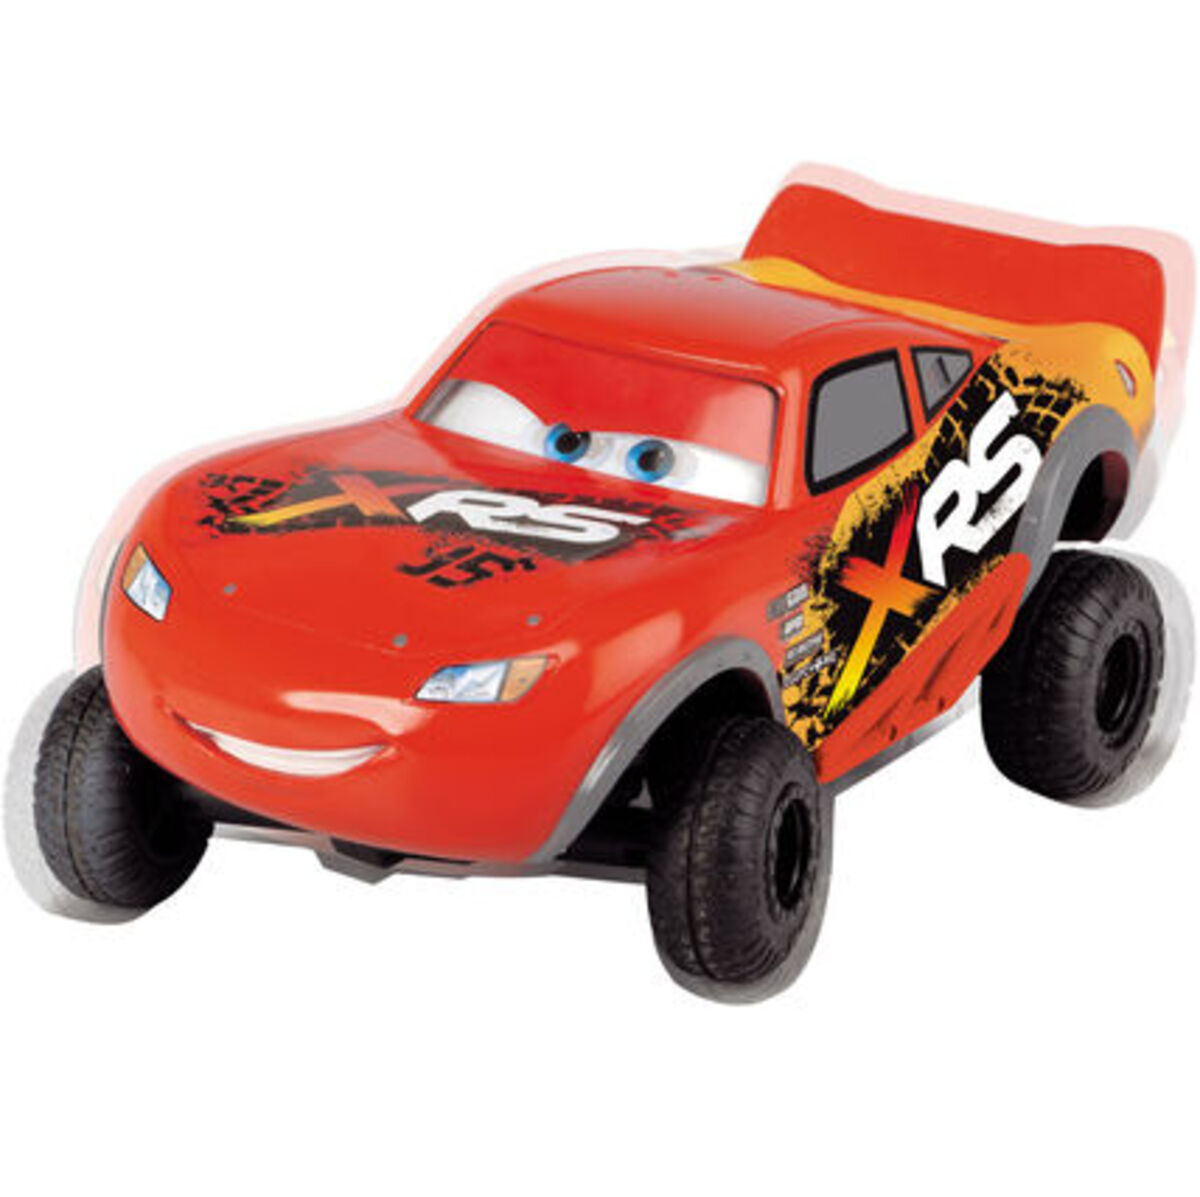 Bild 2 von Dickie Toys Disney Cars RC Lightning McQueen XRS